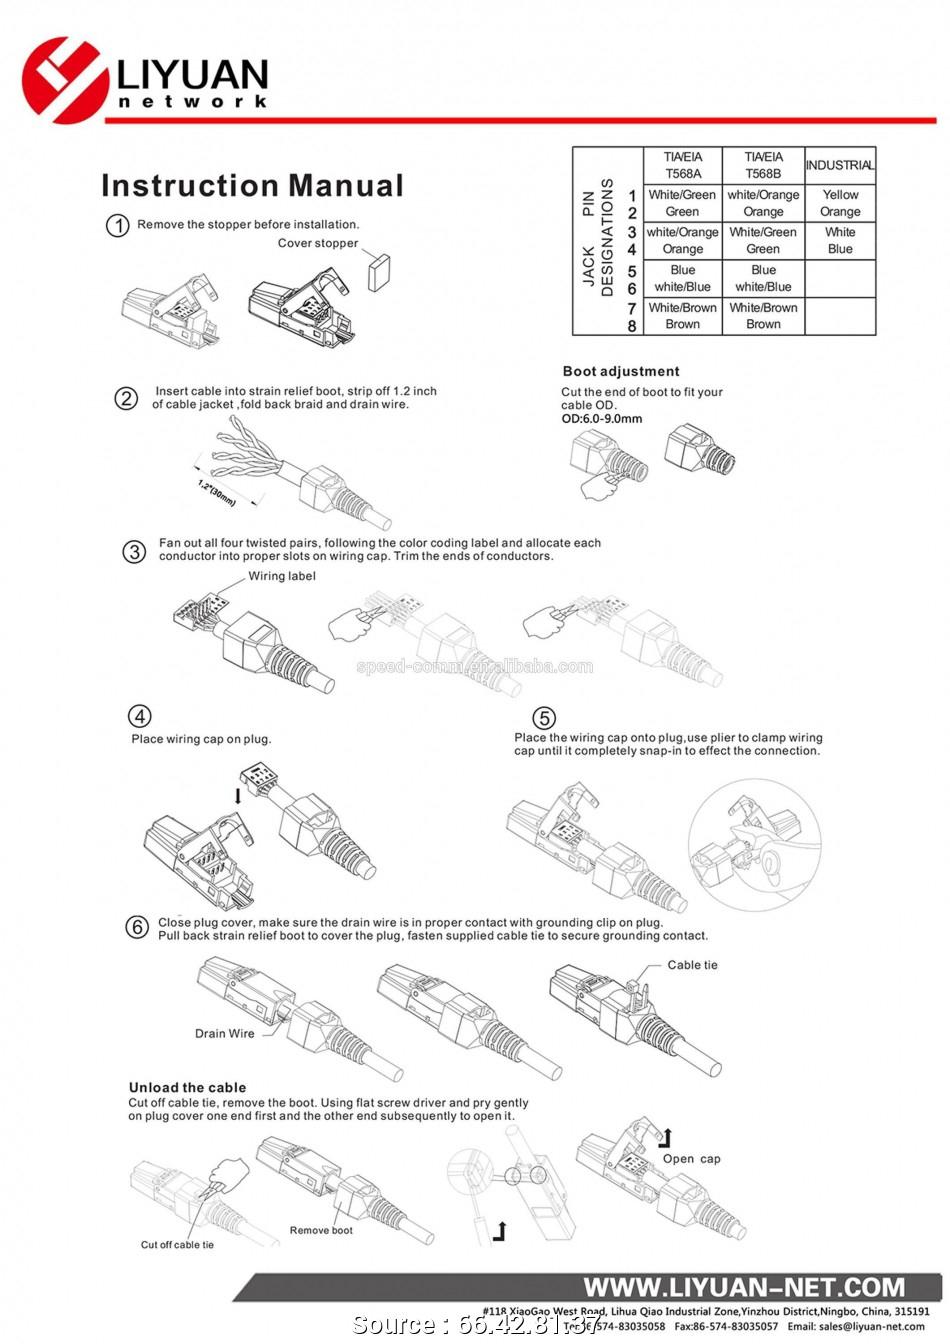 Rs485 Rj45 Wiring Diagram Best Rj14 Jack Wiring Diagram Residential - Rs 485 Wiring Diagram